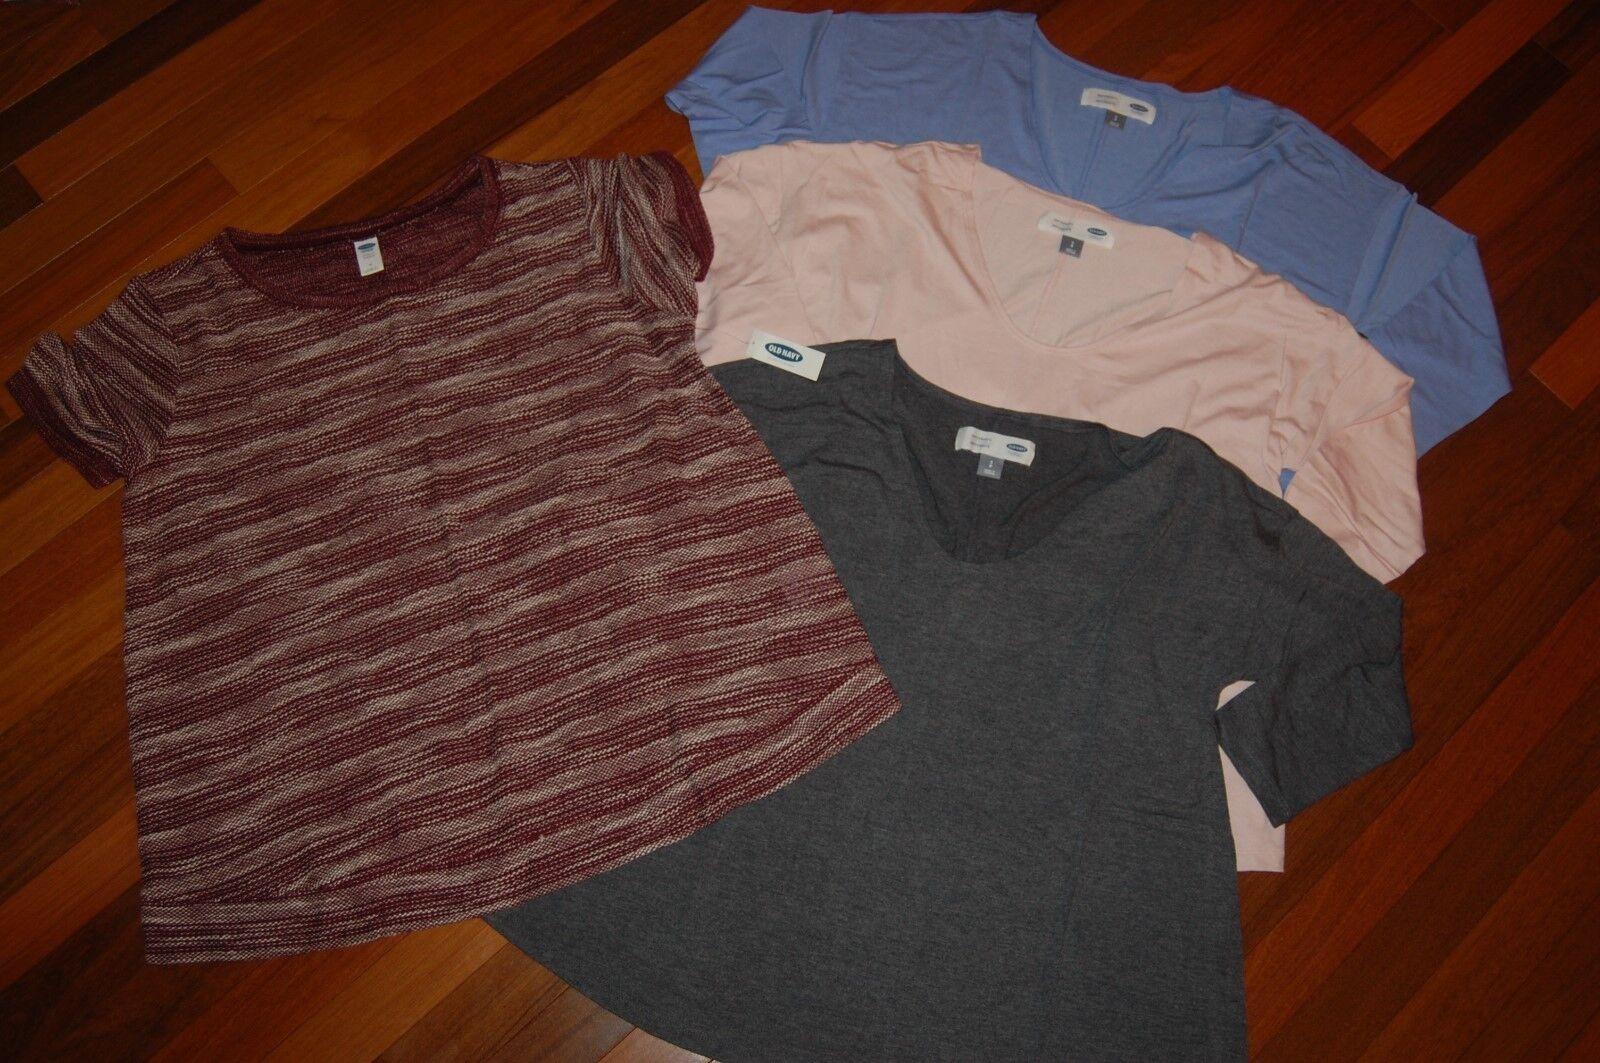 NWT Maternity Old Navy Lot of 4 Shirts NICE Tops size MEDIUM